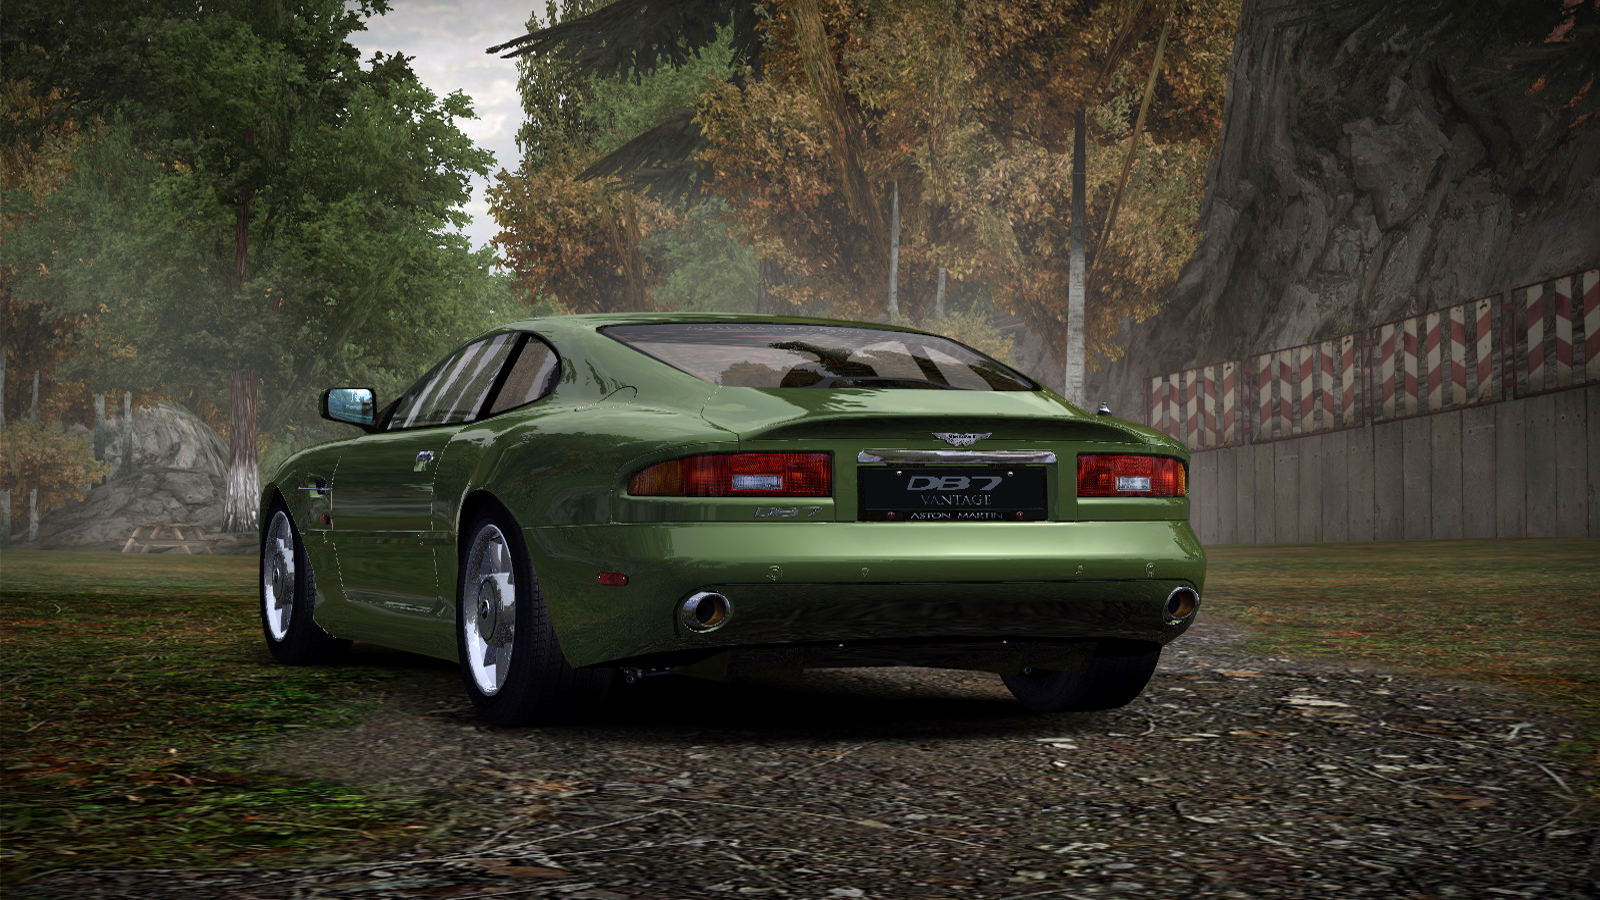 Speed 2020-01-05 19-29-01-994.jpg - Need for Speed: Most Wanted (2005) Aston Martin DB7 Vantage, Автомобиль